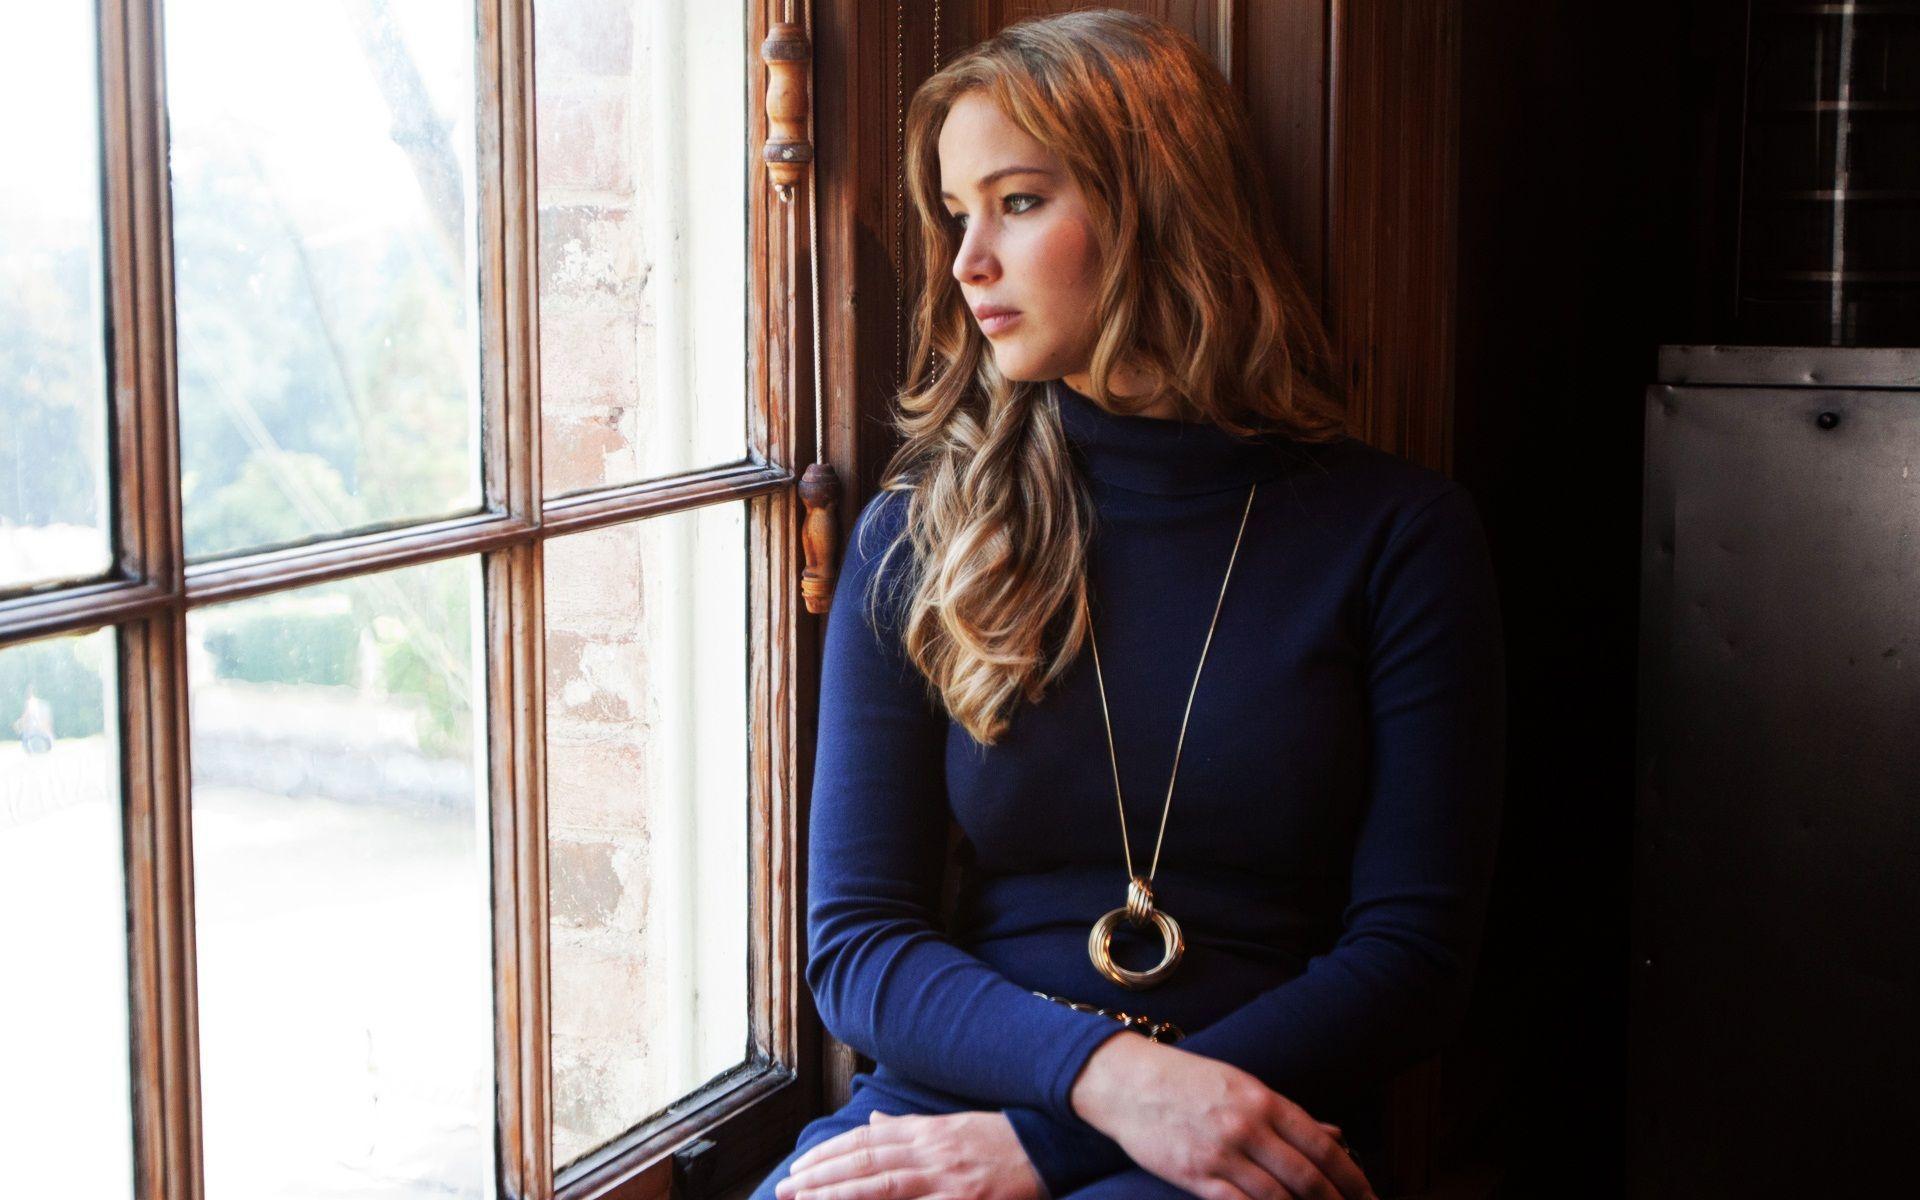 Jennifer Lawrence Wallpapers | HD Wallpapers